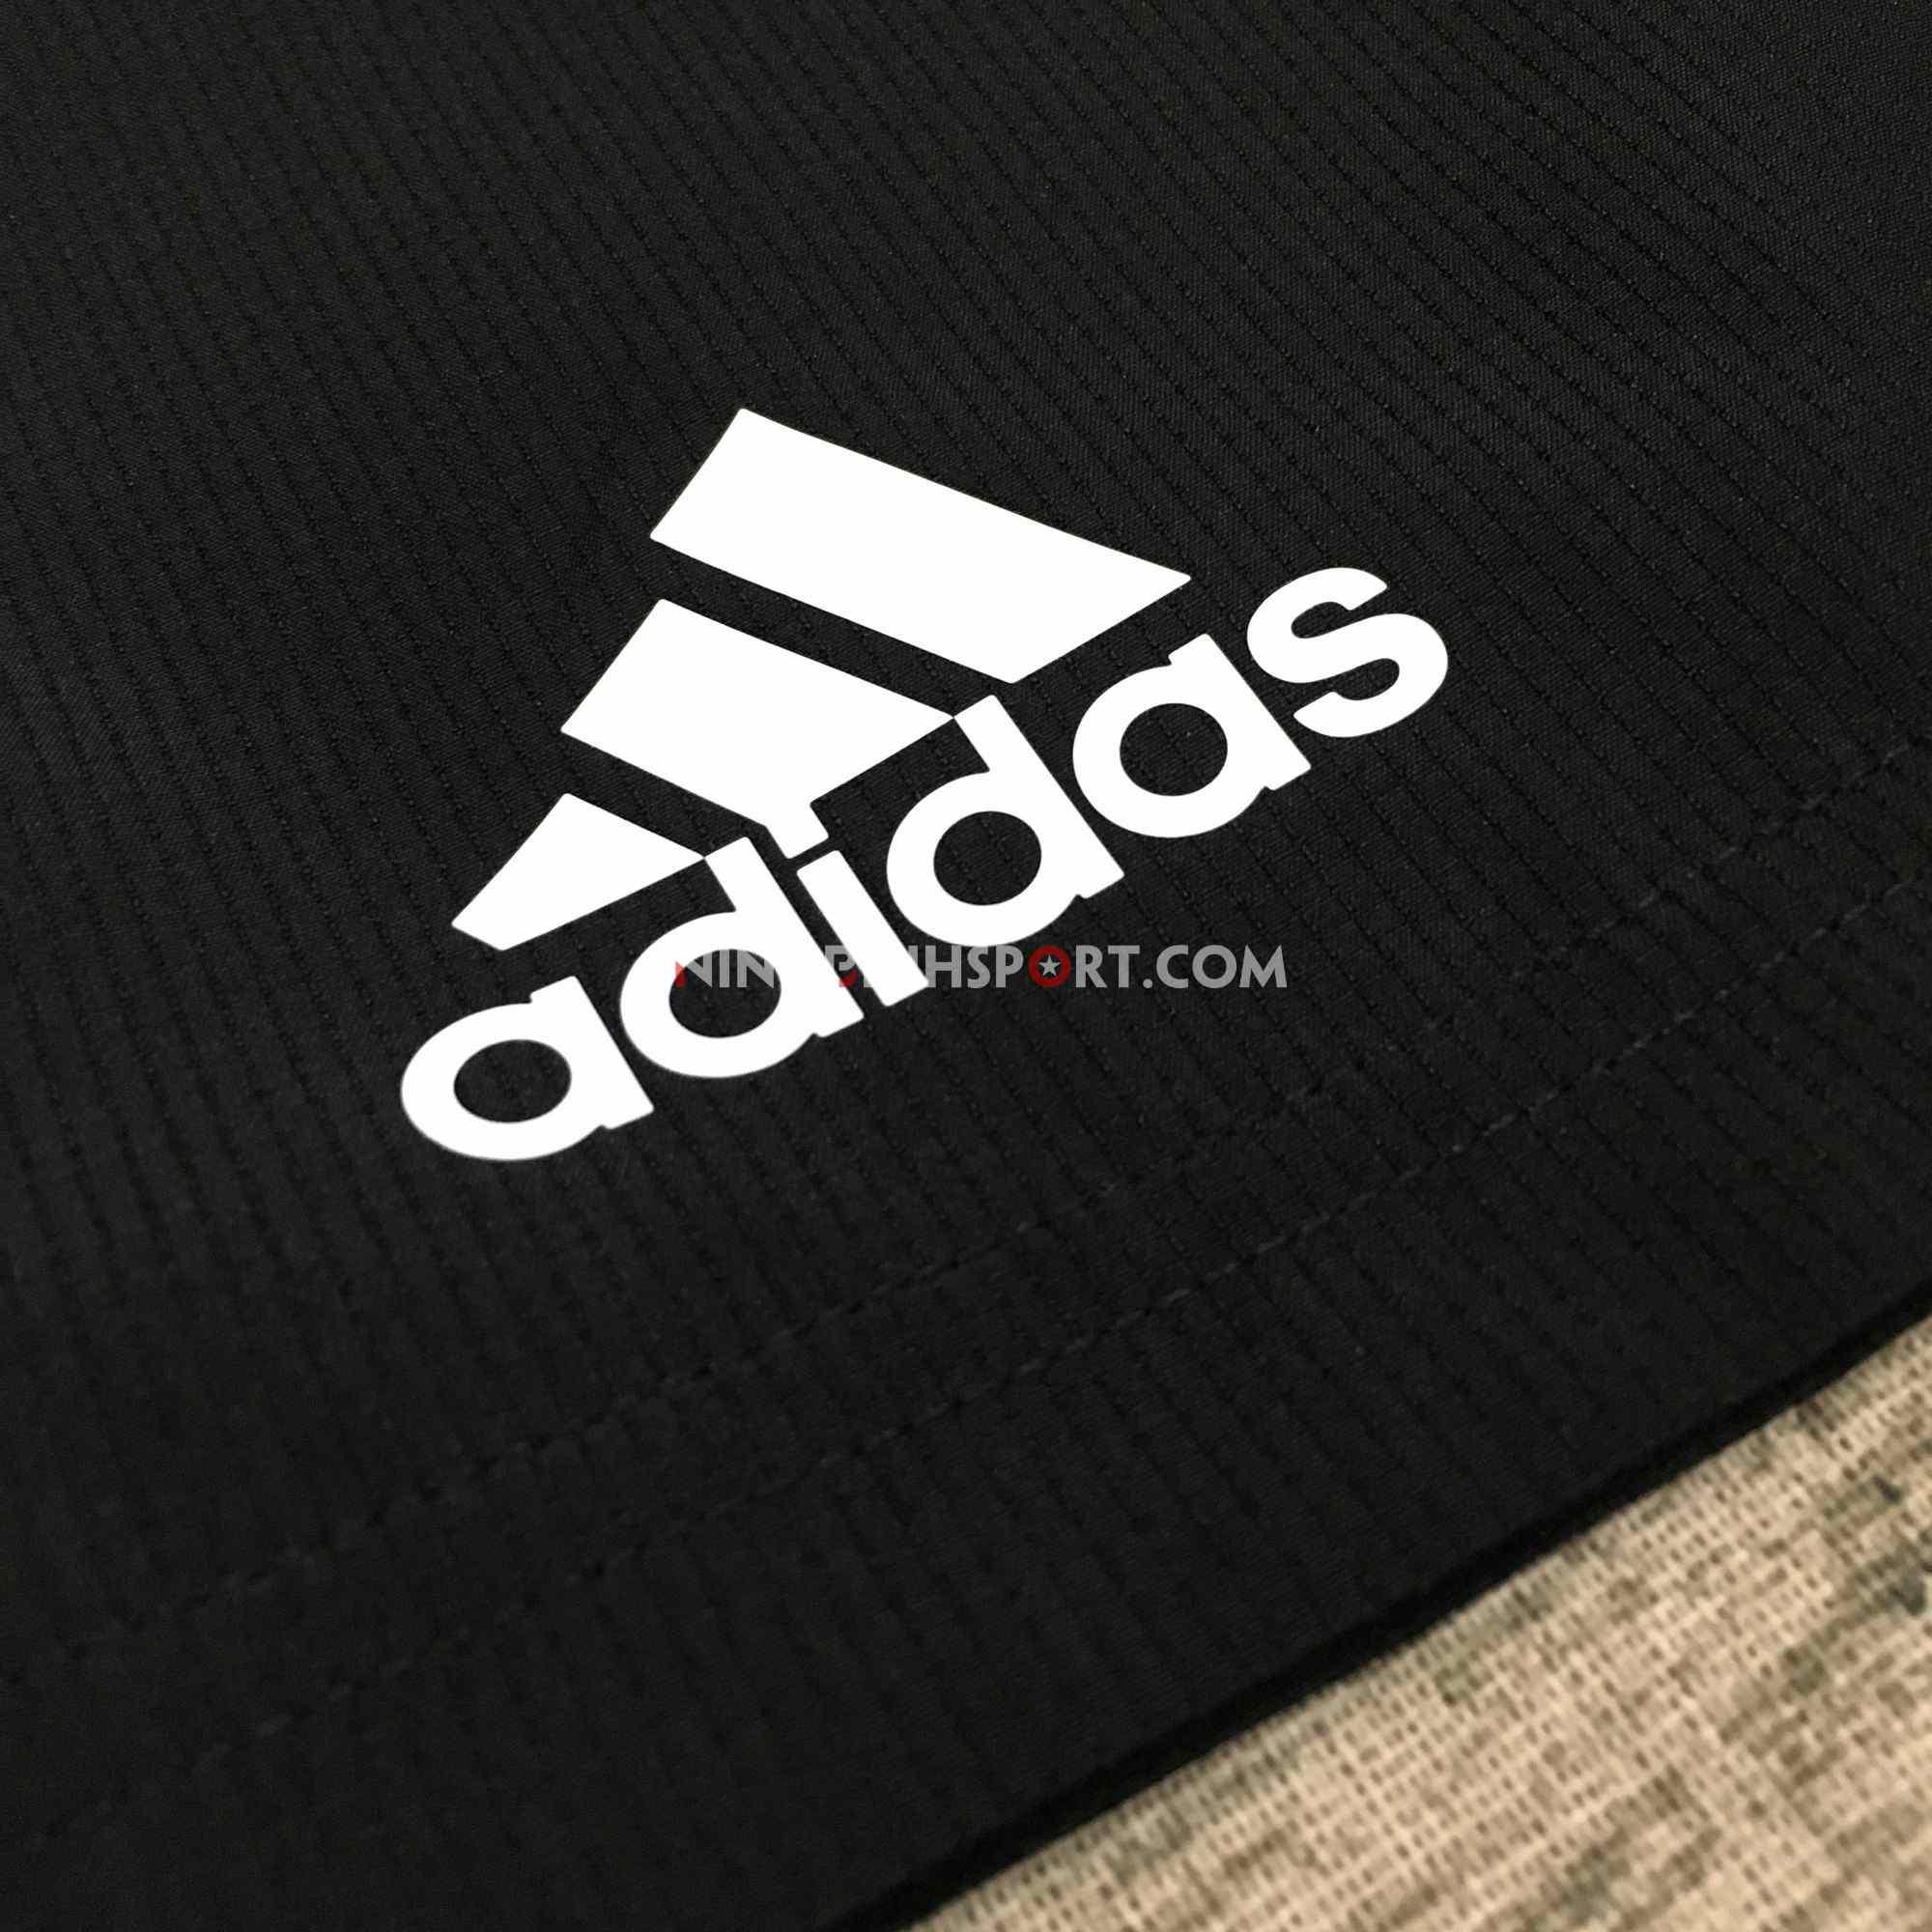 Quần thể thao nam Adidas Club 9in DU0877